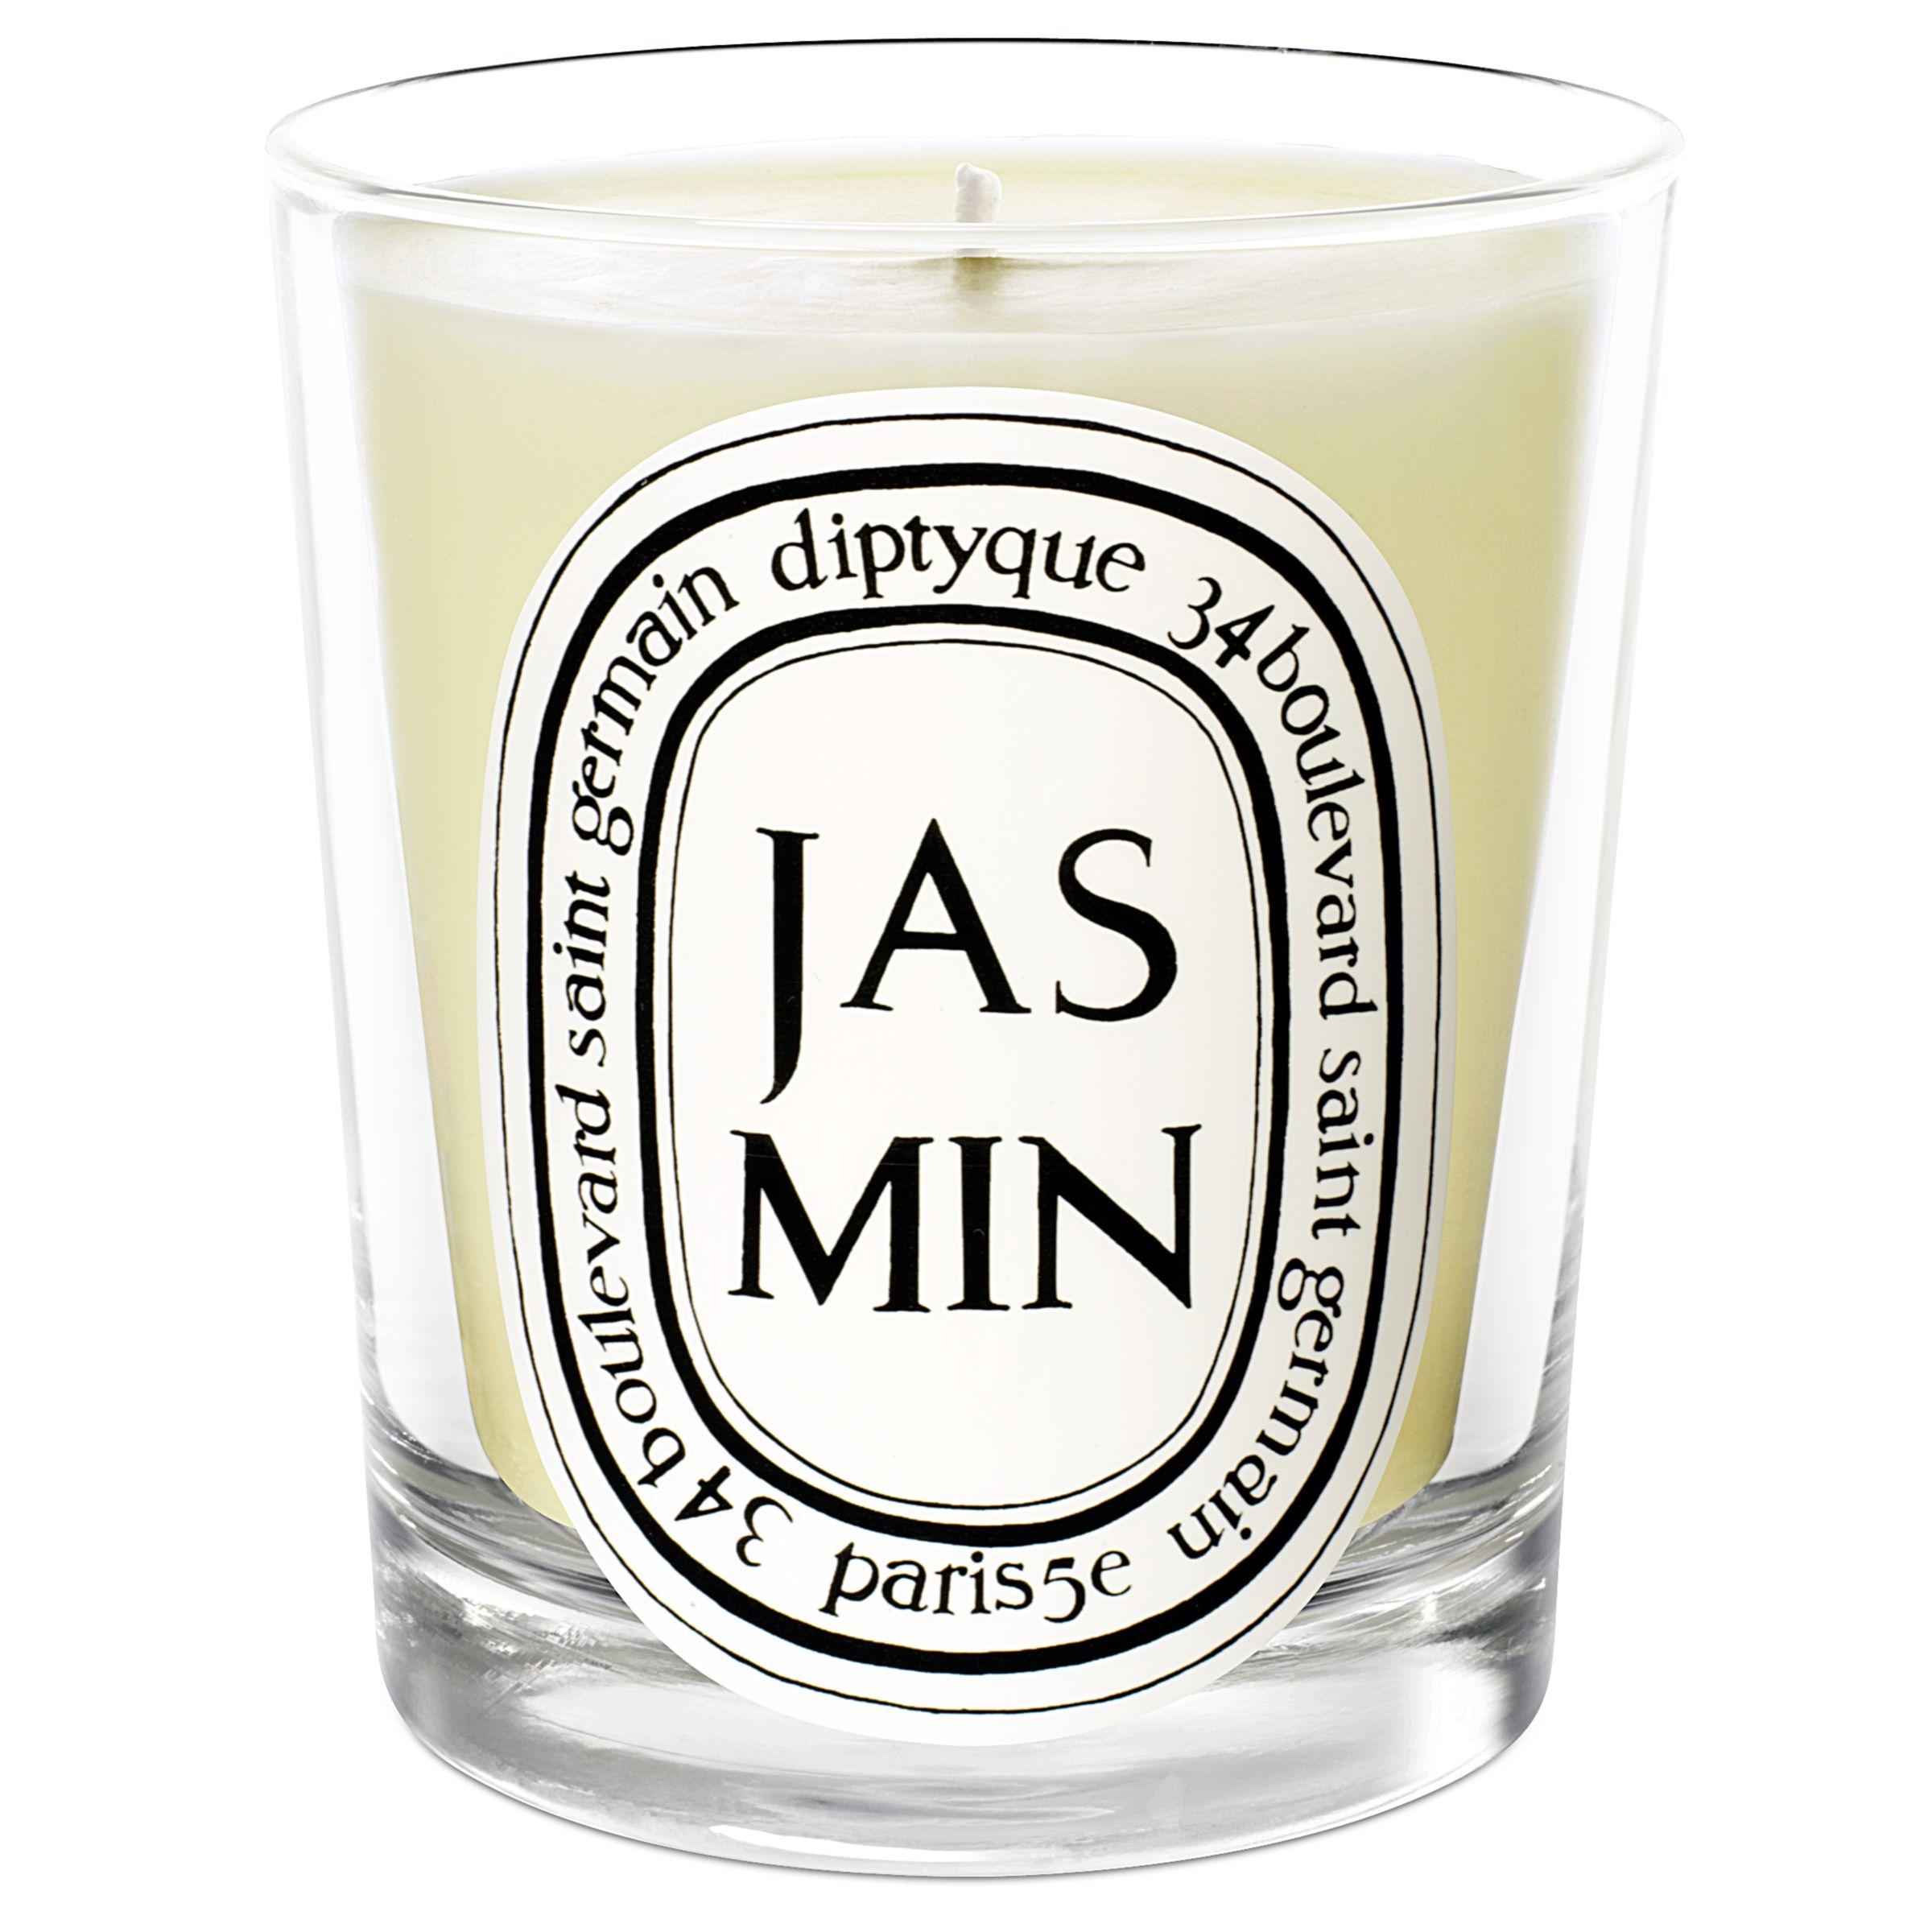 Diptyque Diptyque Jasmin Scented Candle, 190g